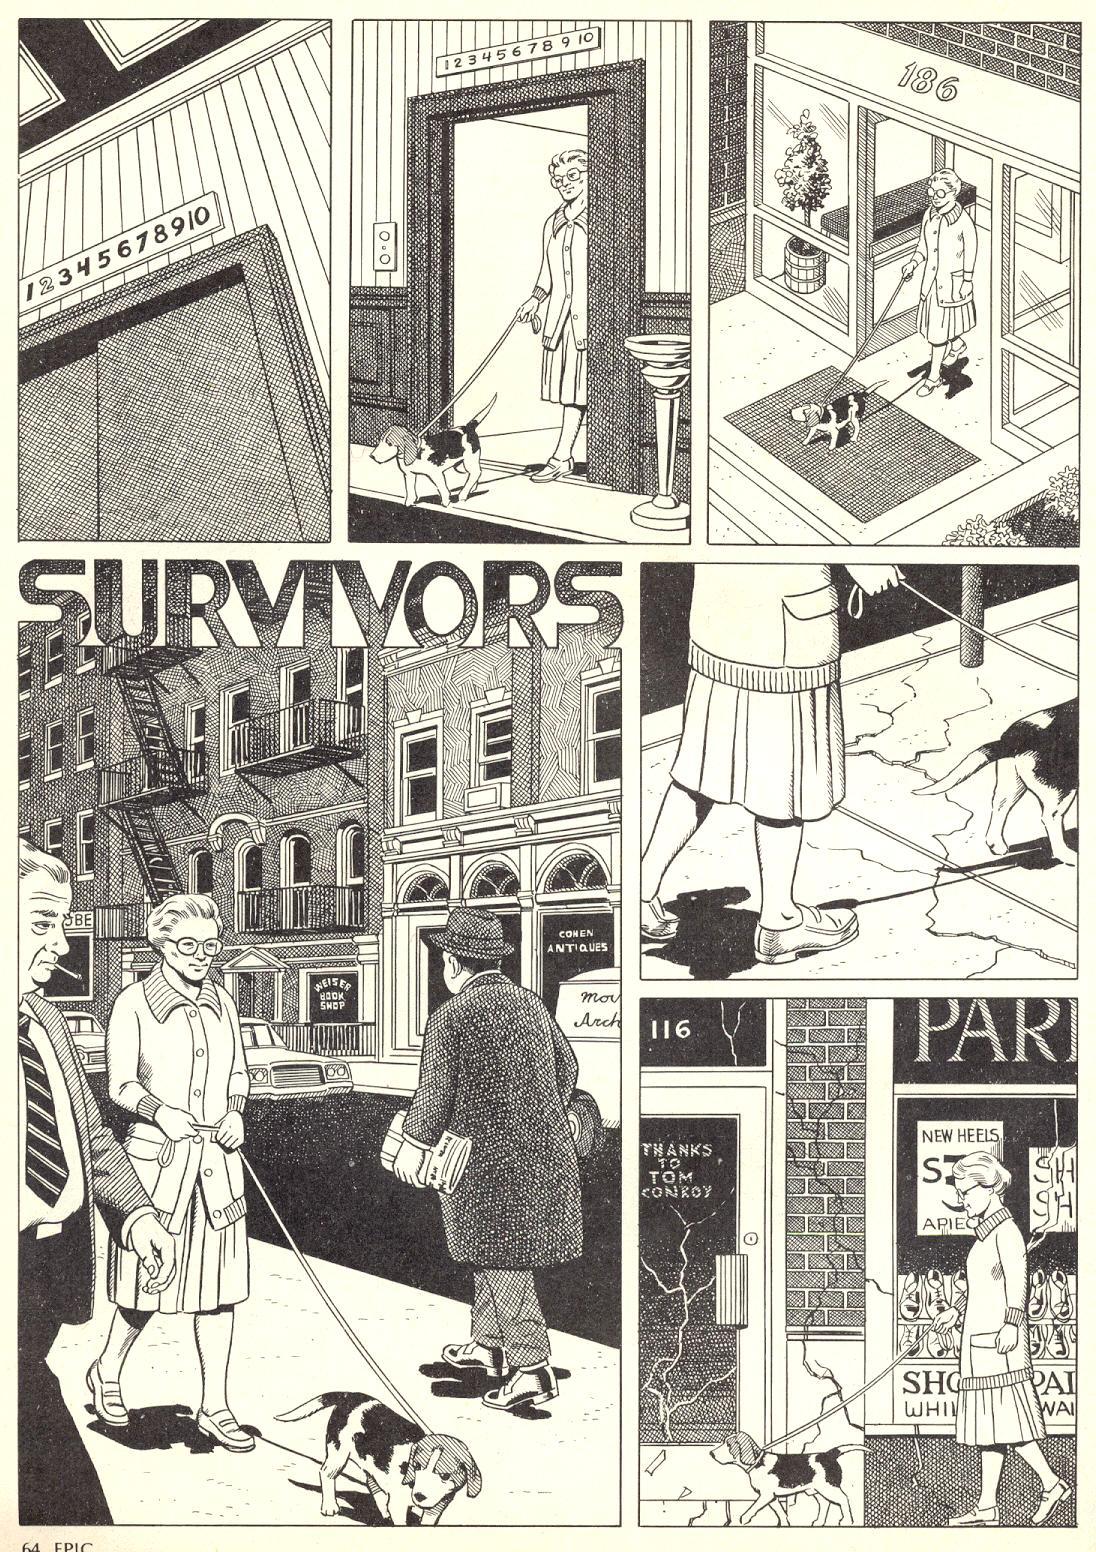 Epic Illustrated (1980) #4 Survivors pg1.